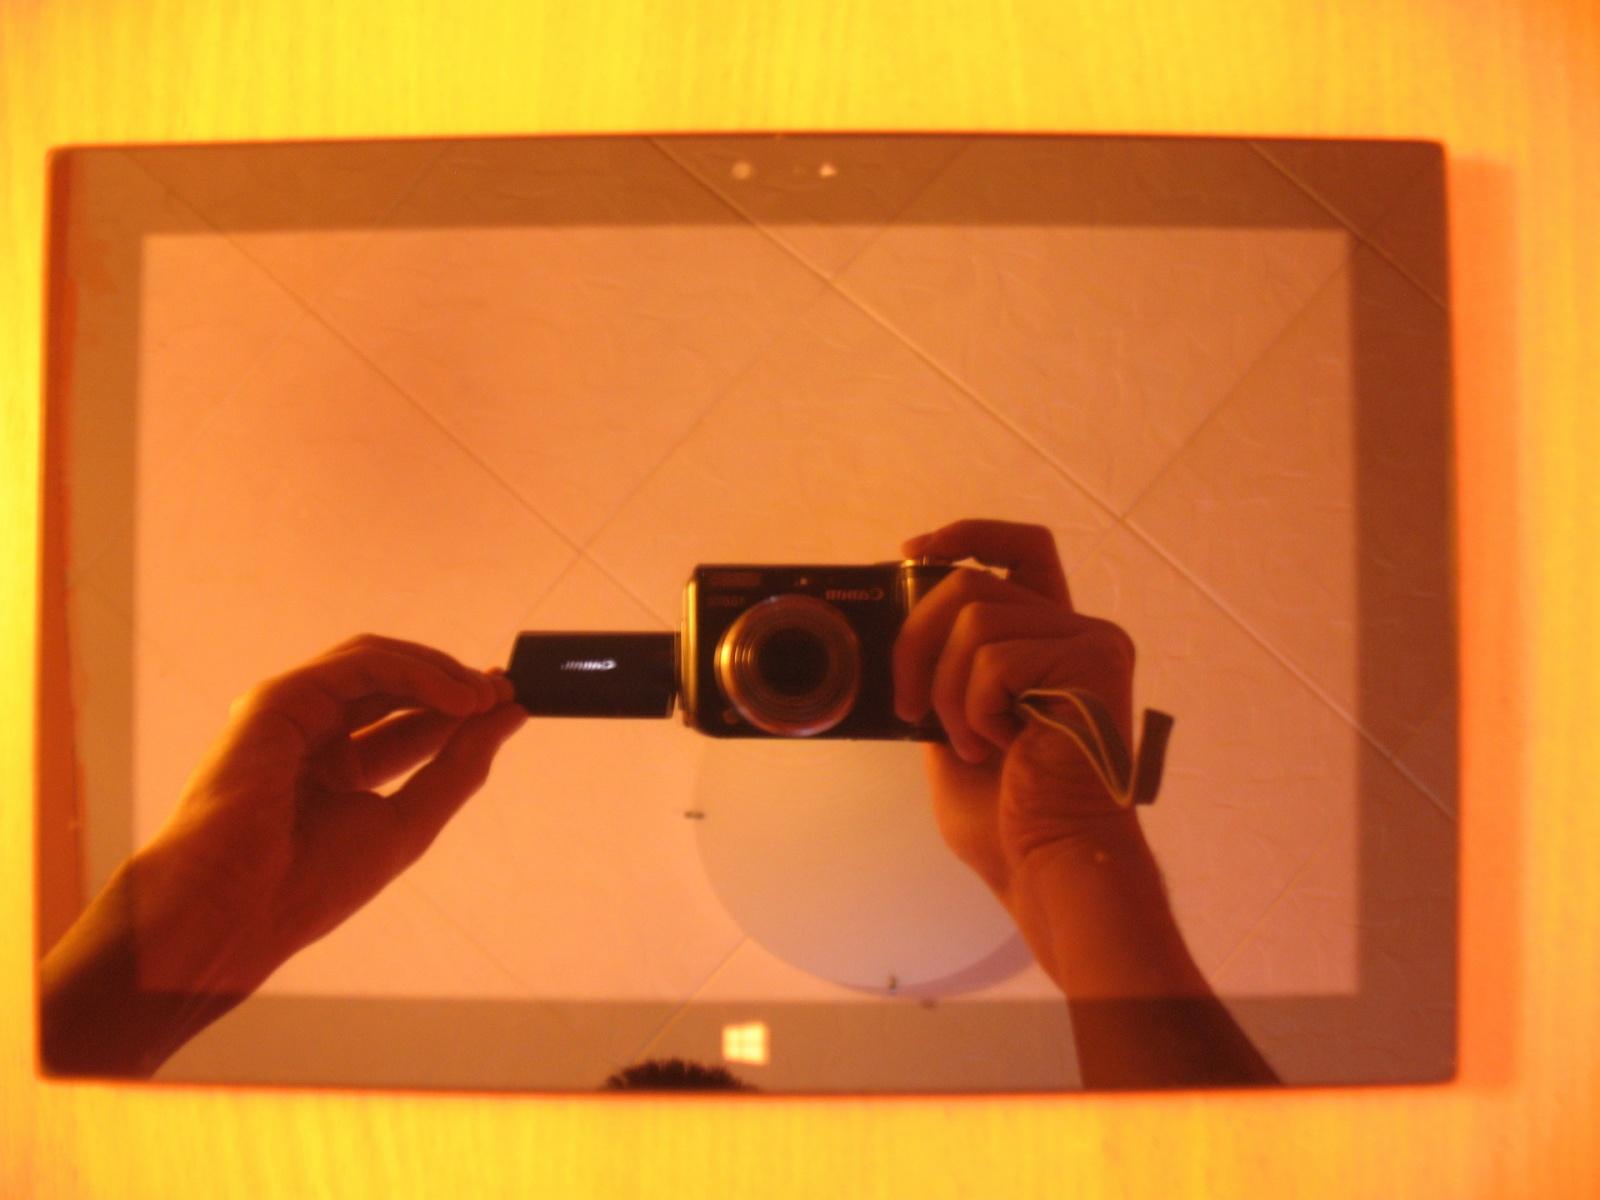 Обзор планшета на Windows 8.1 (Vido w11c) - 10